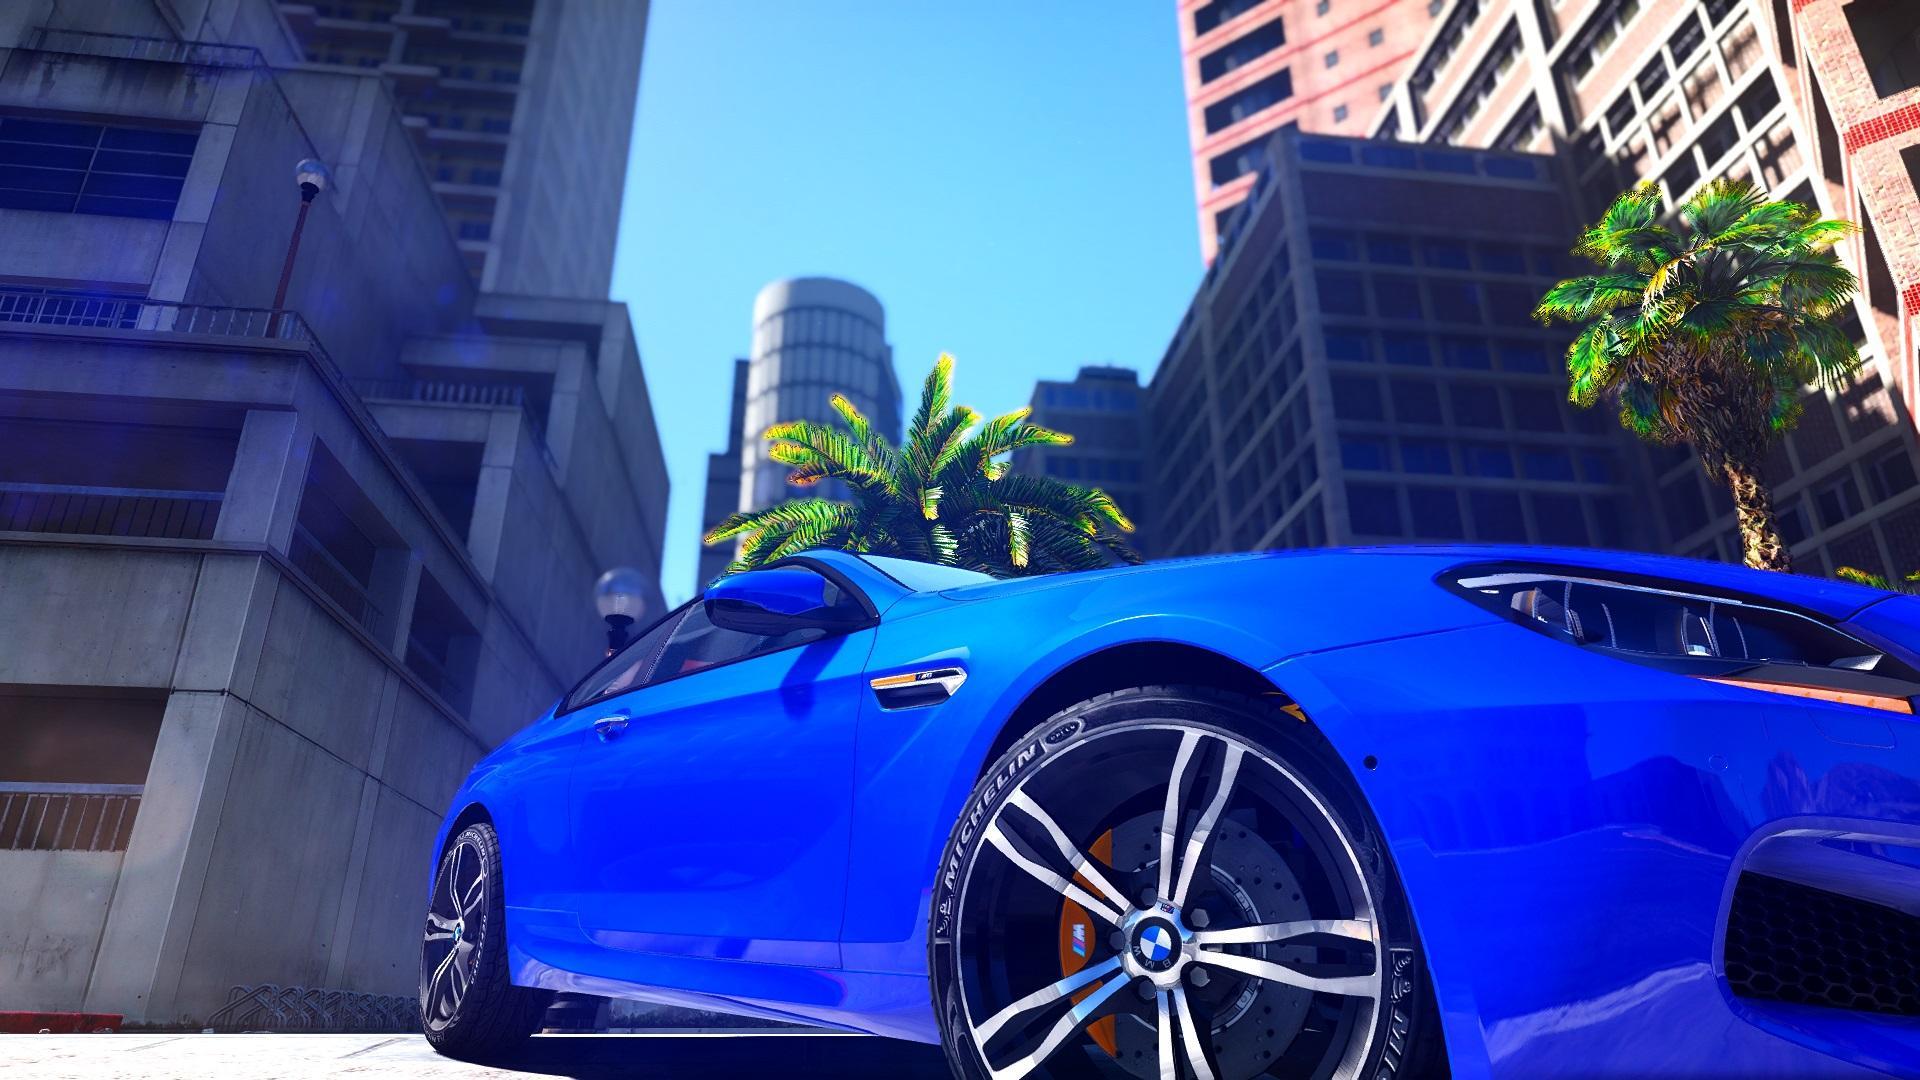 handling gta5 cars car mods vehicles 2022